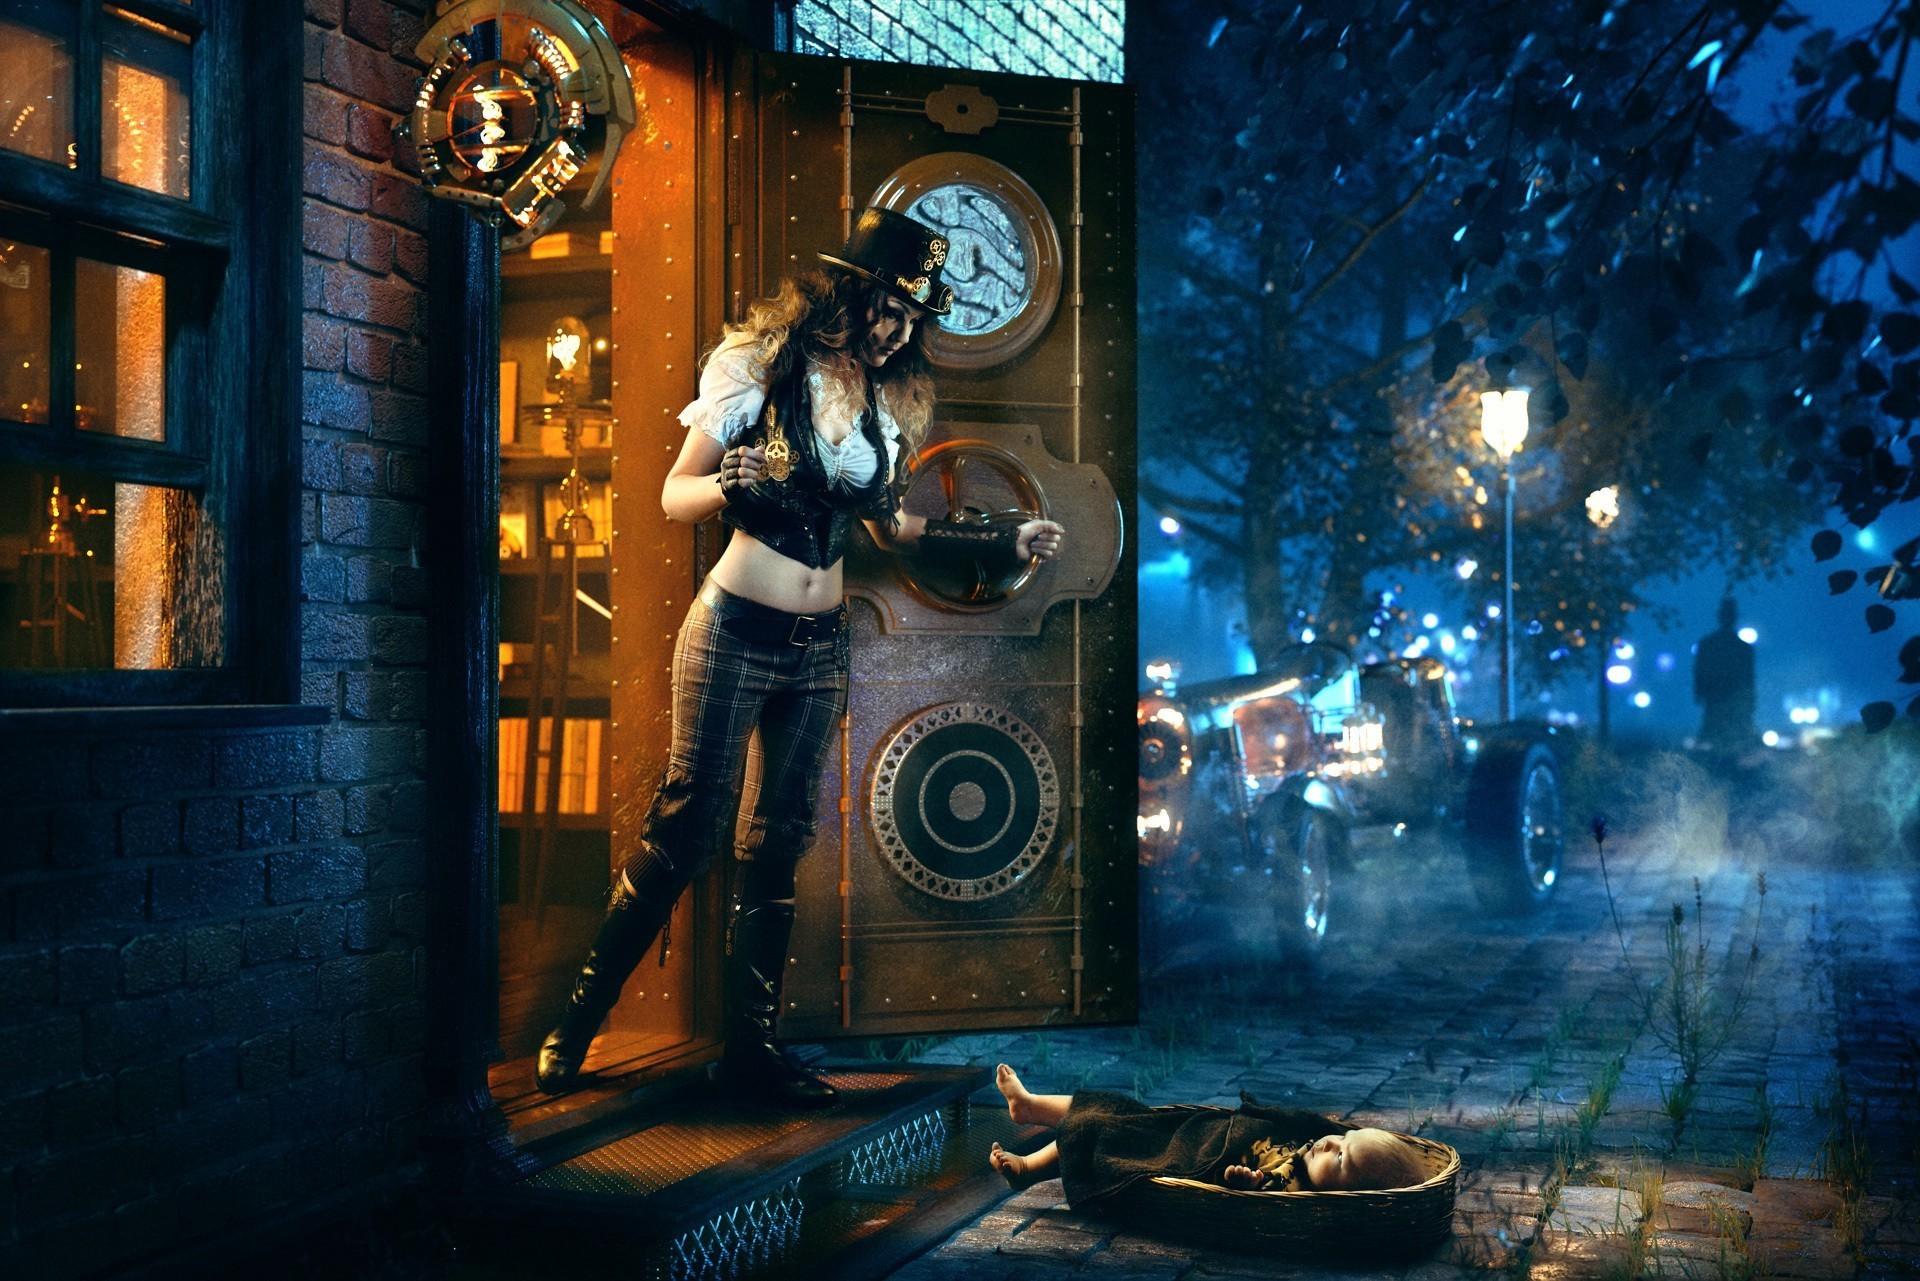 Smart Girl Wallpaper Full Hd Steampunk Desktop Background 70 Images